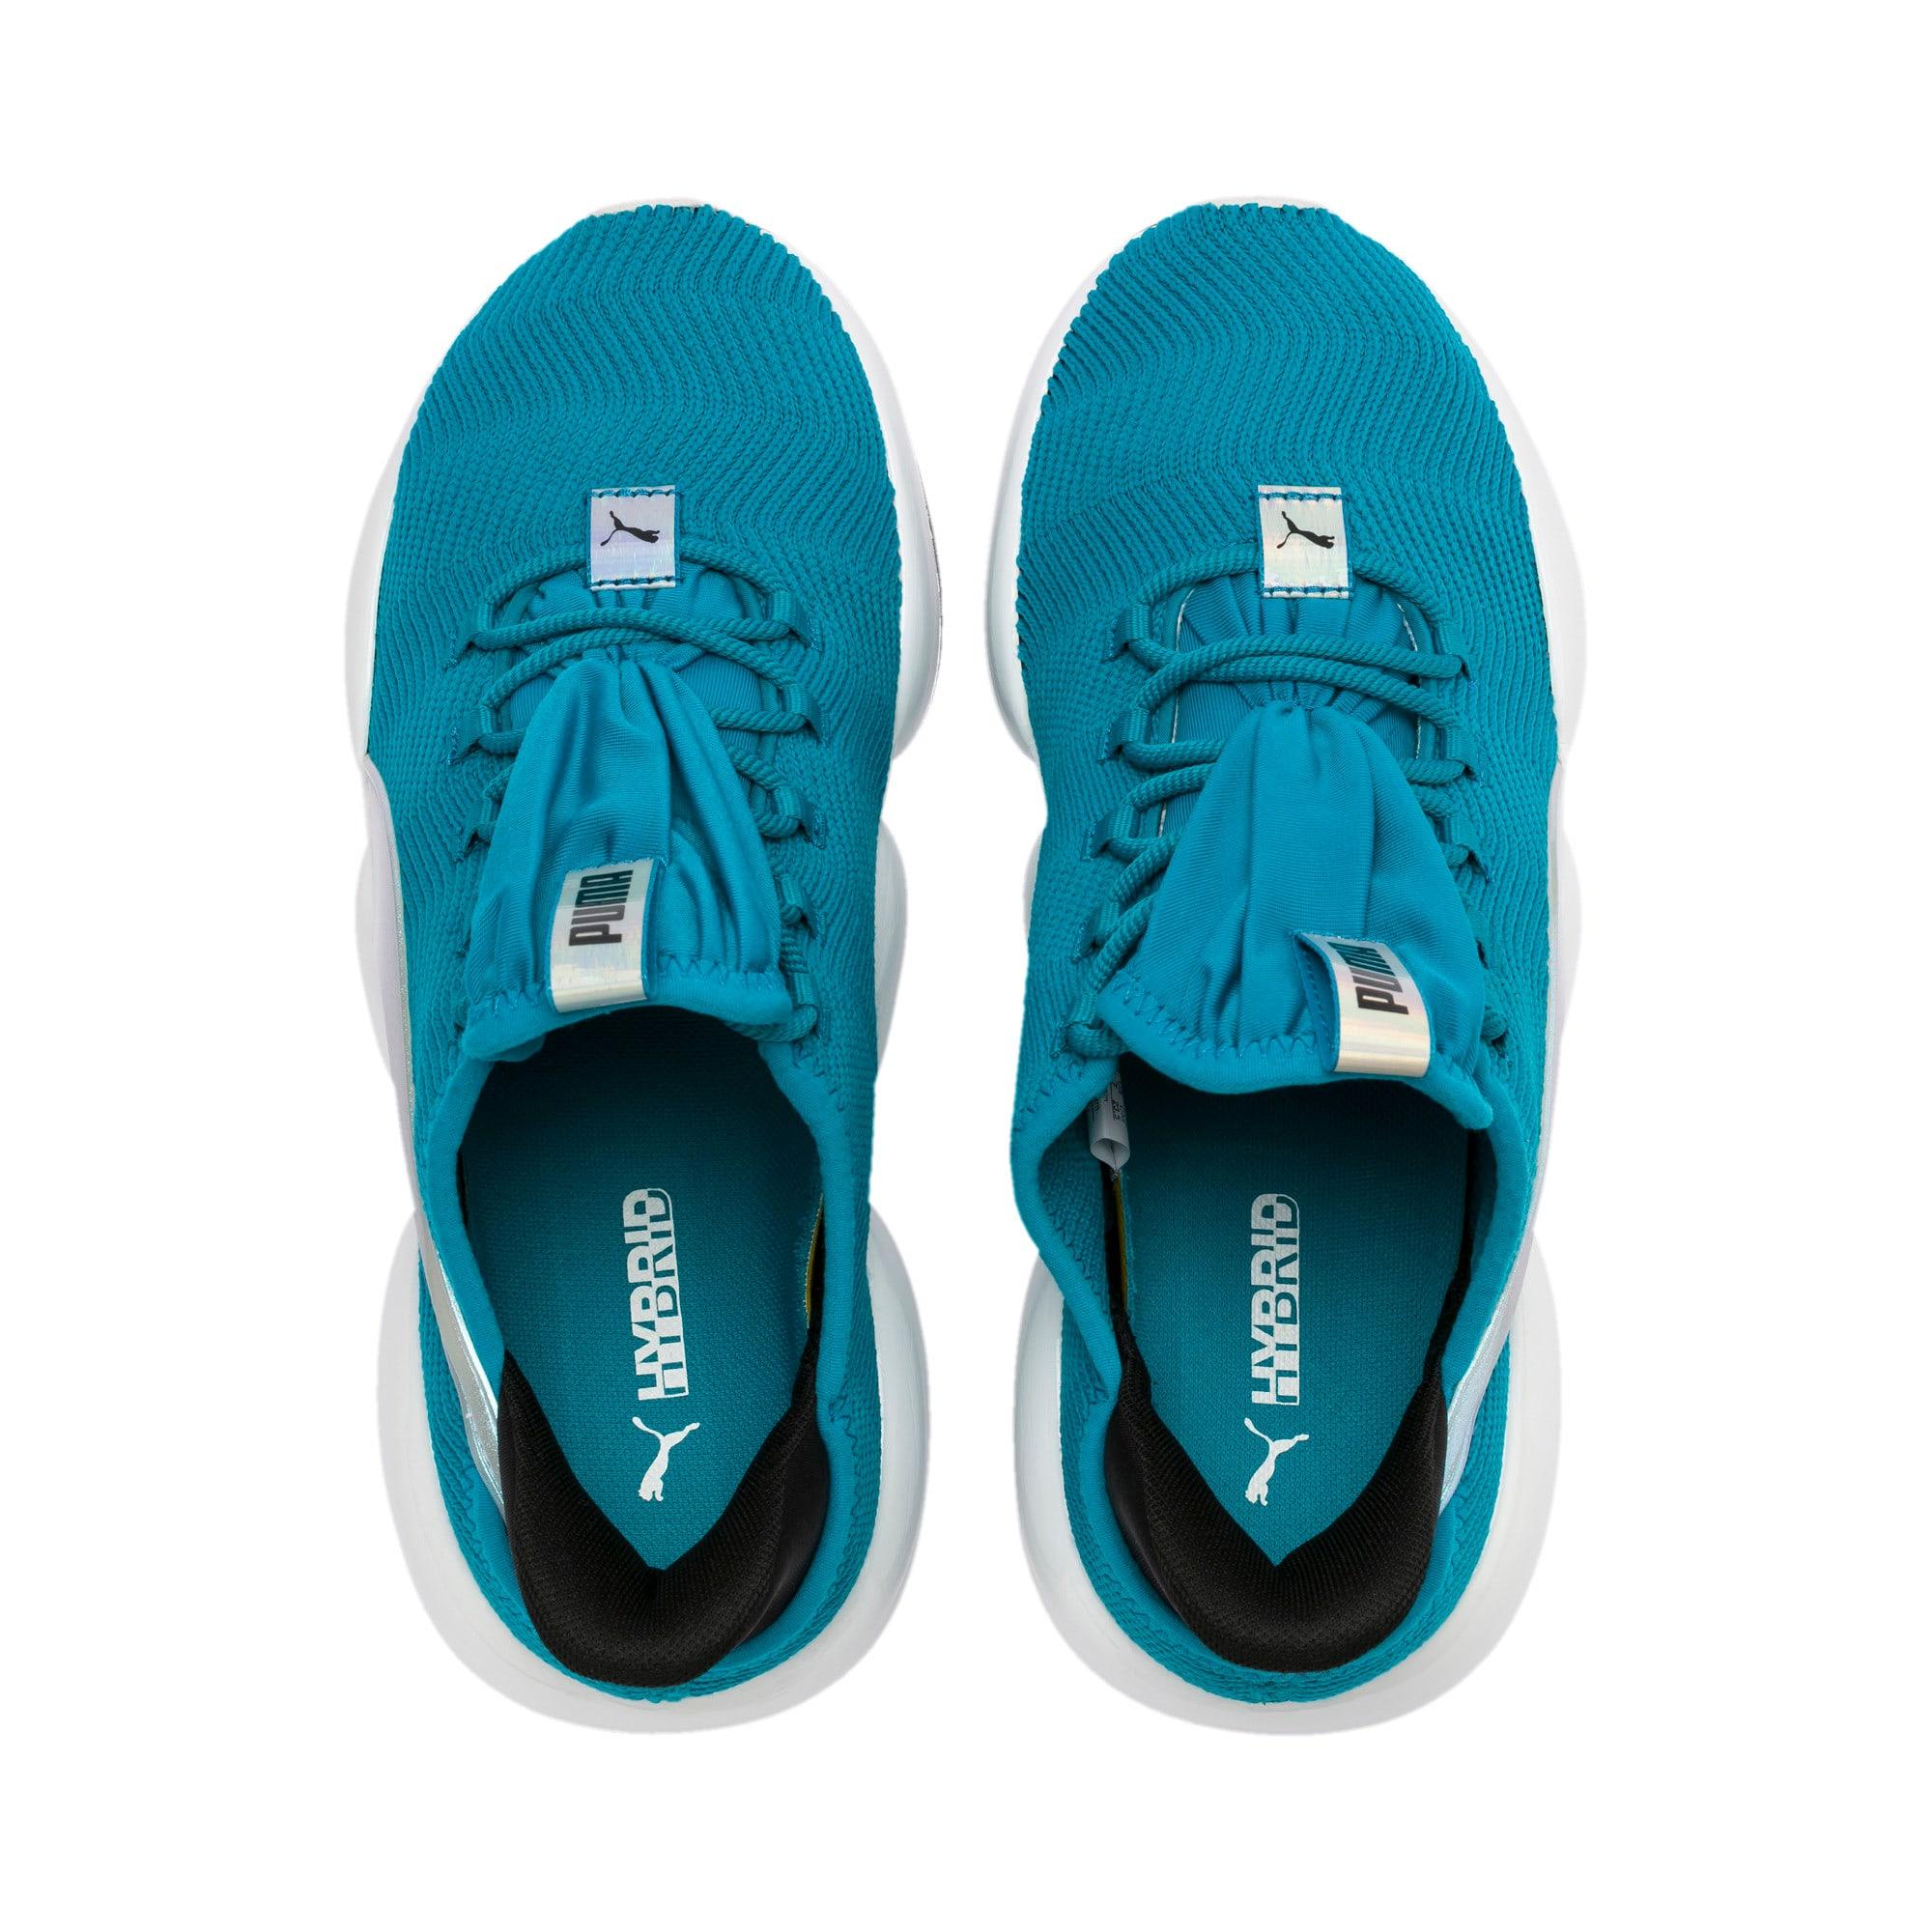 Imagen en miniatura 7 de Zapatillas de mujer Mode XT Iridescent Trailblazer, Caribbean Sea-Puma White, mediana